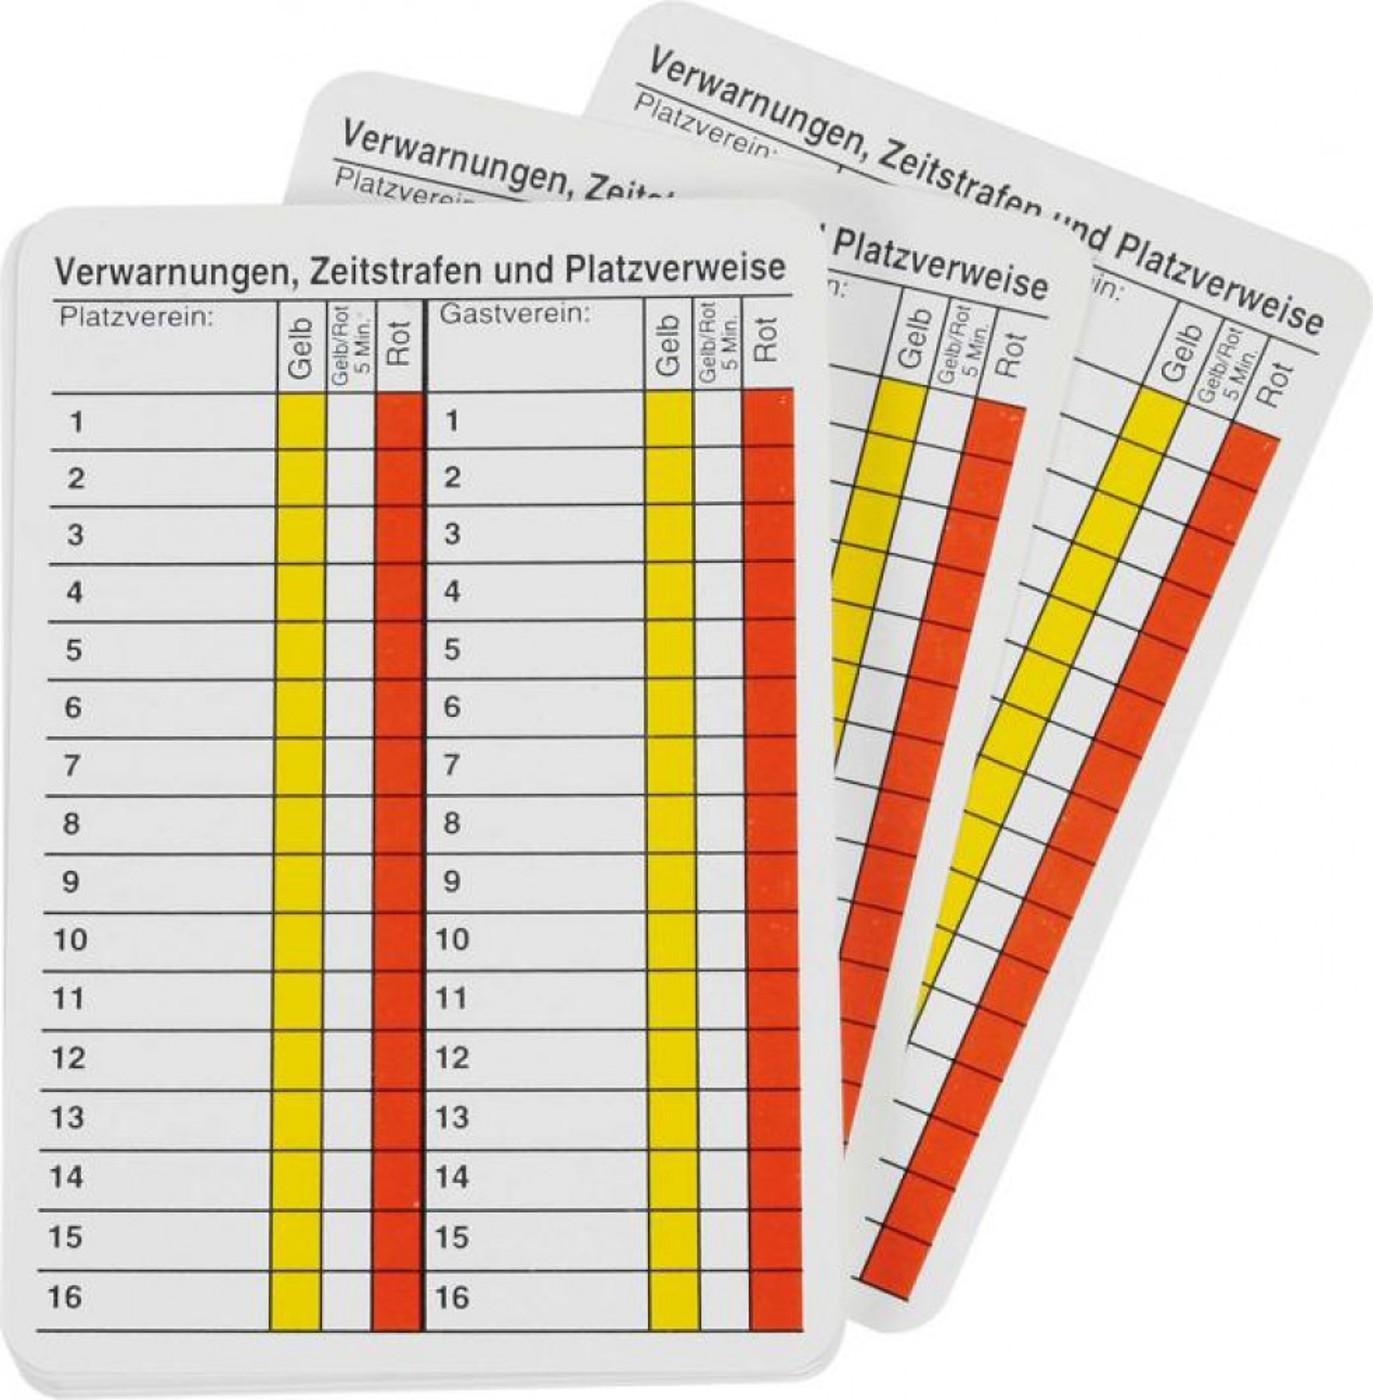 V3TEC INFORMATION CARDS